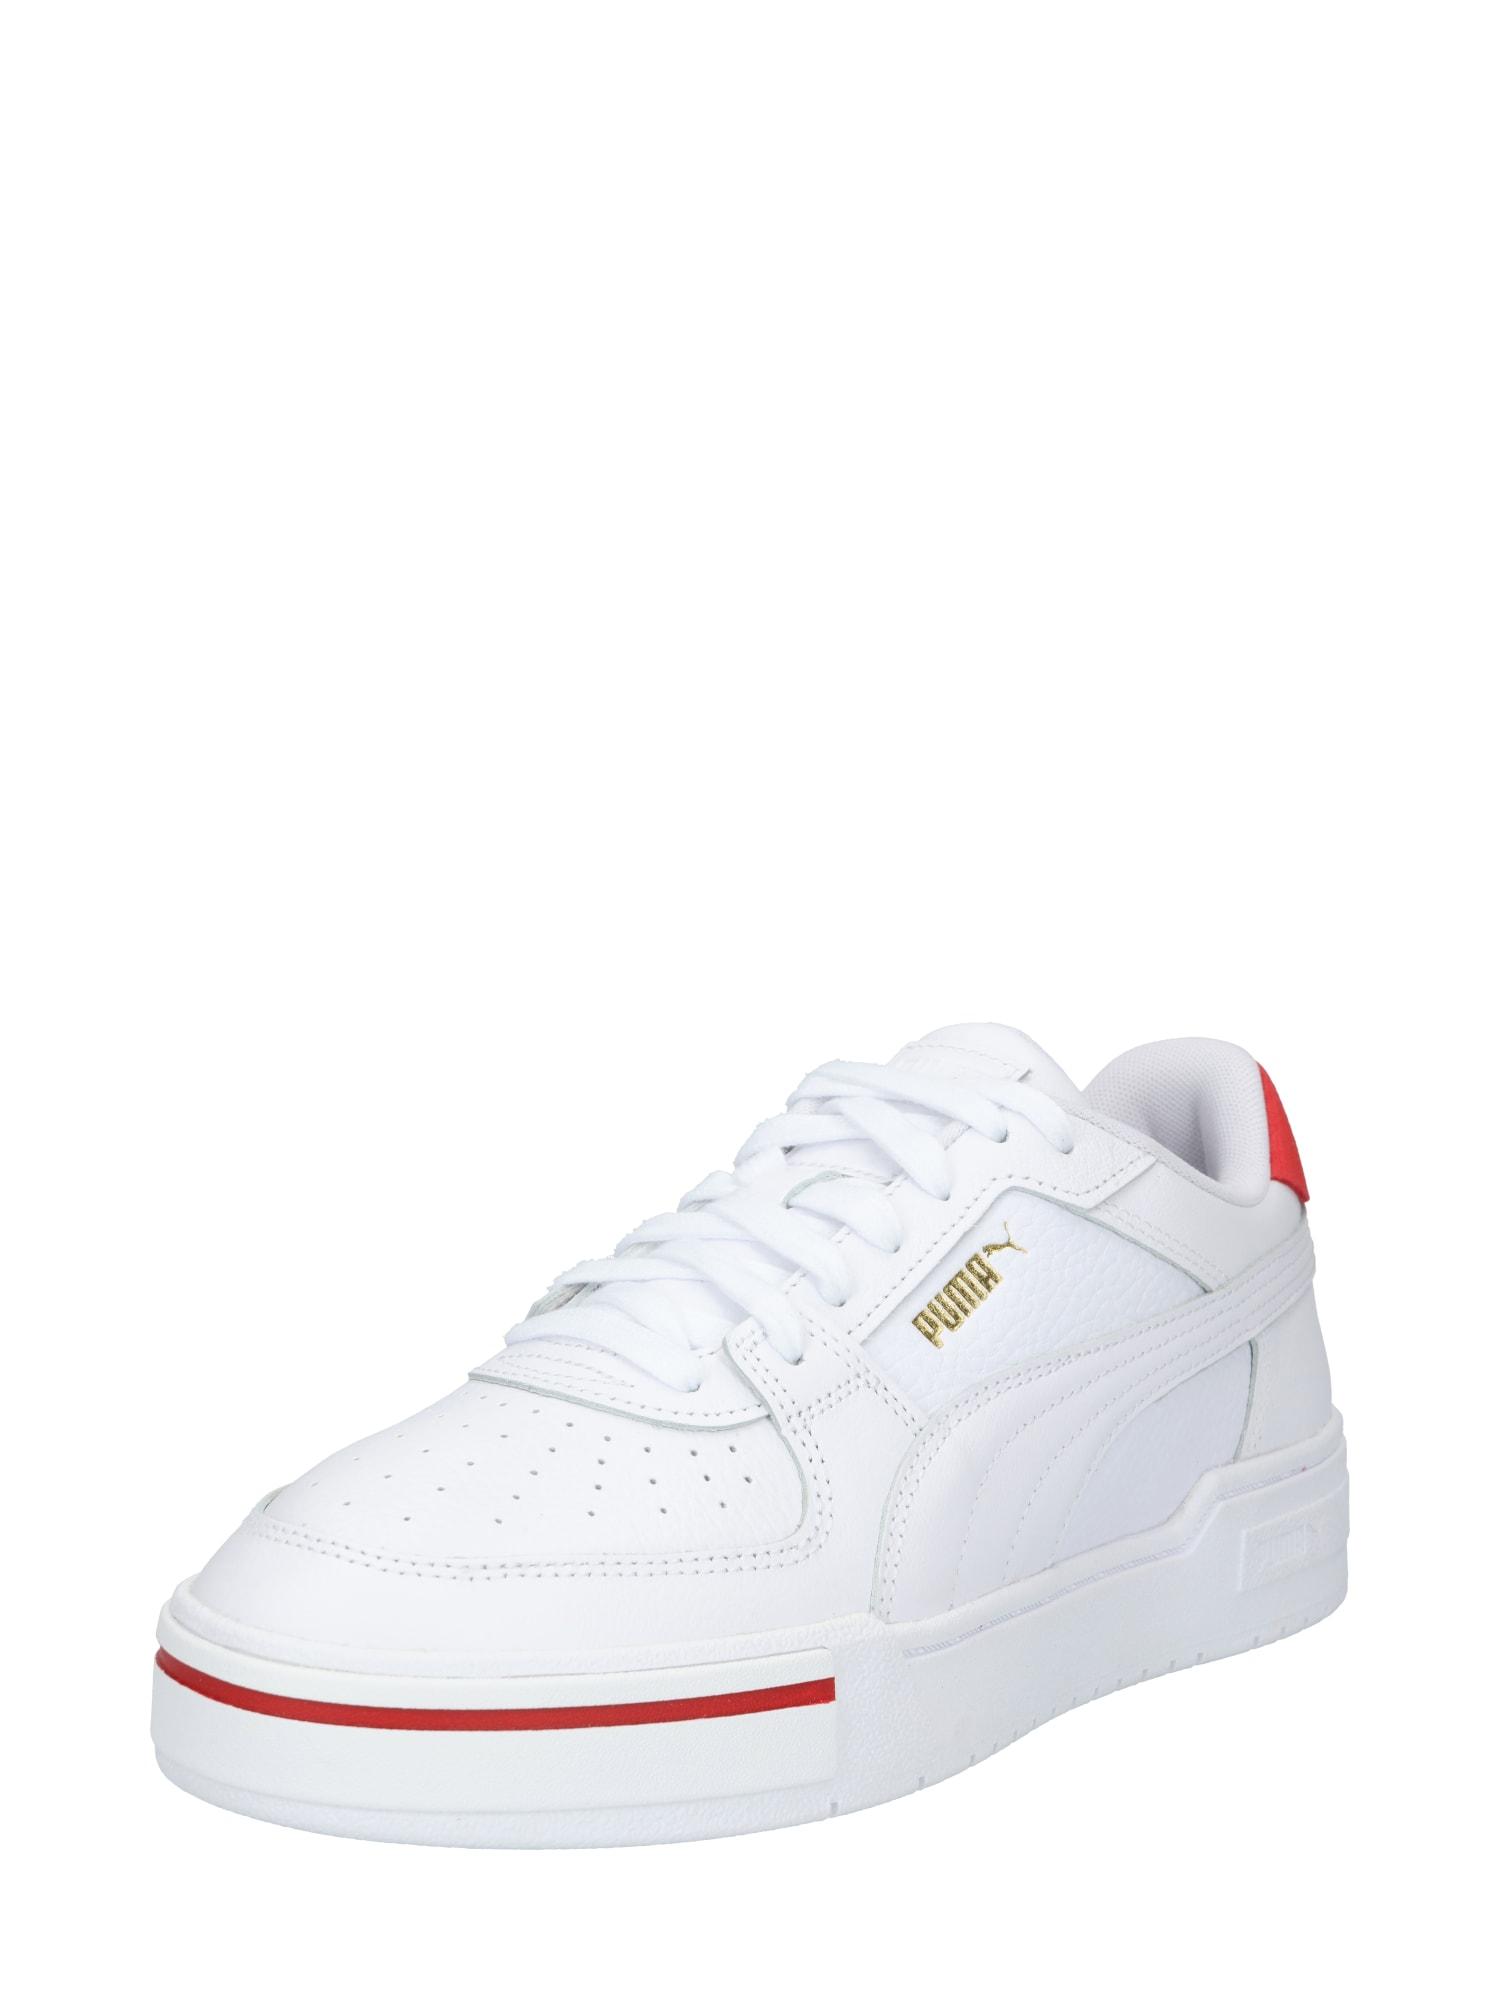 PUMA Sneaker bassa 'Heritage'  bianco / rosso male shop the look